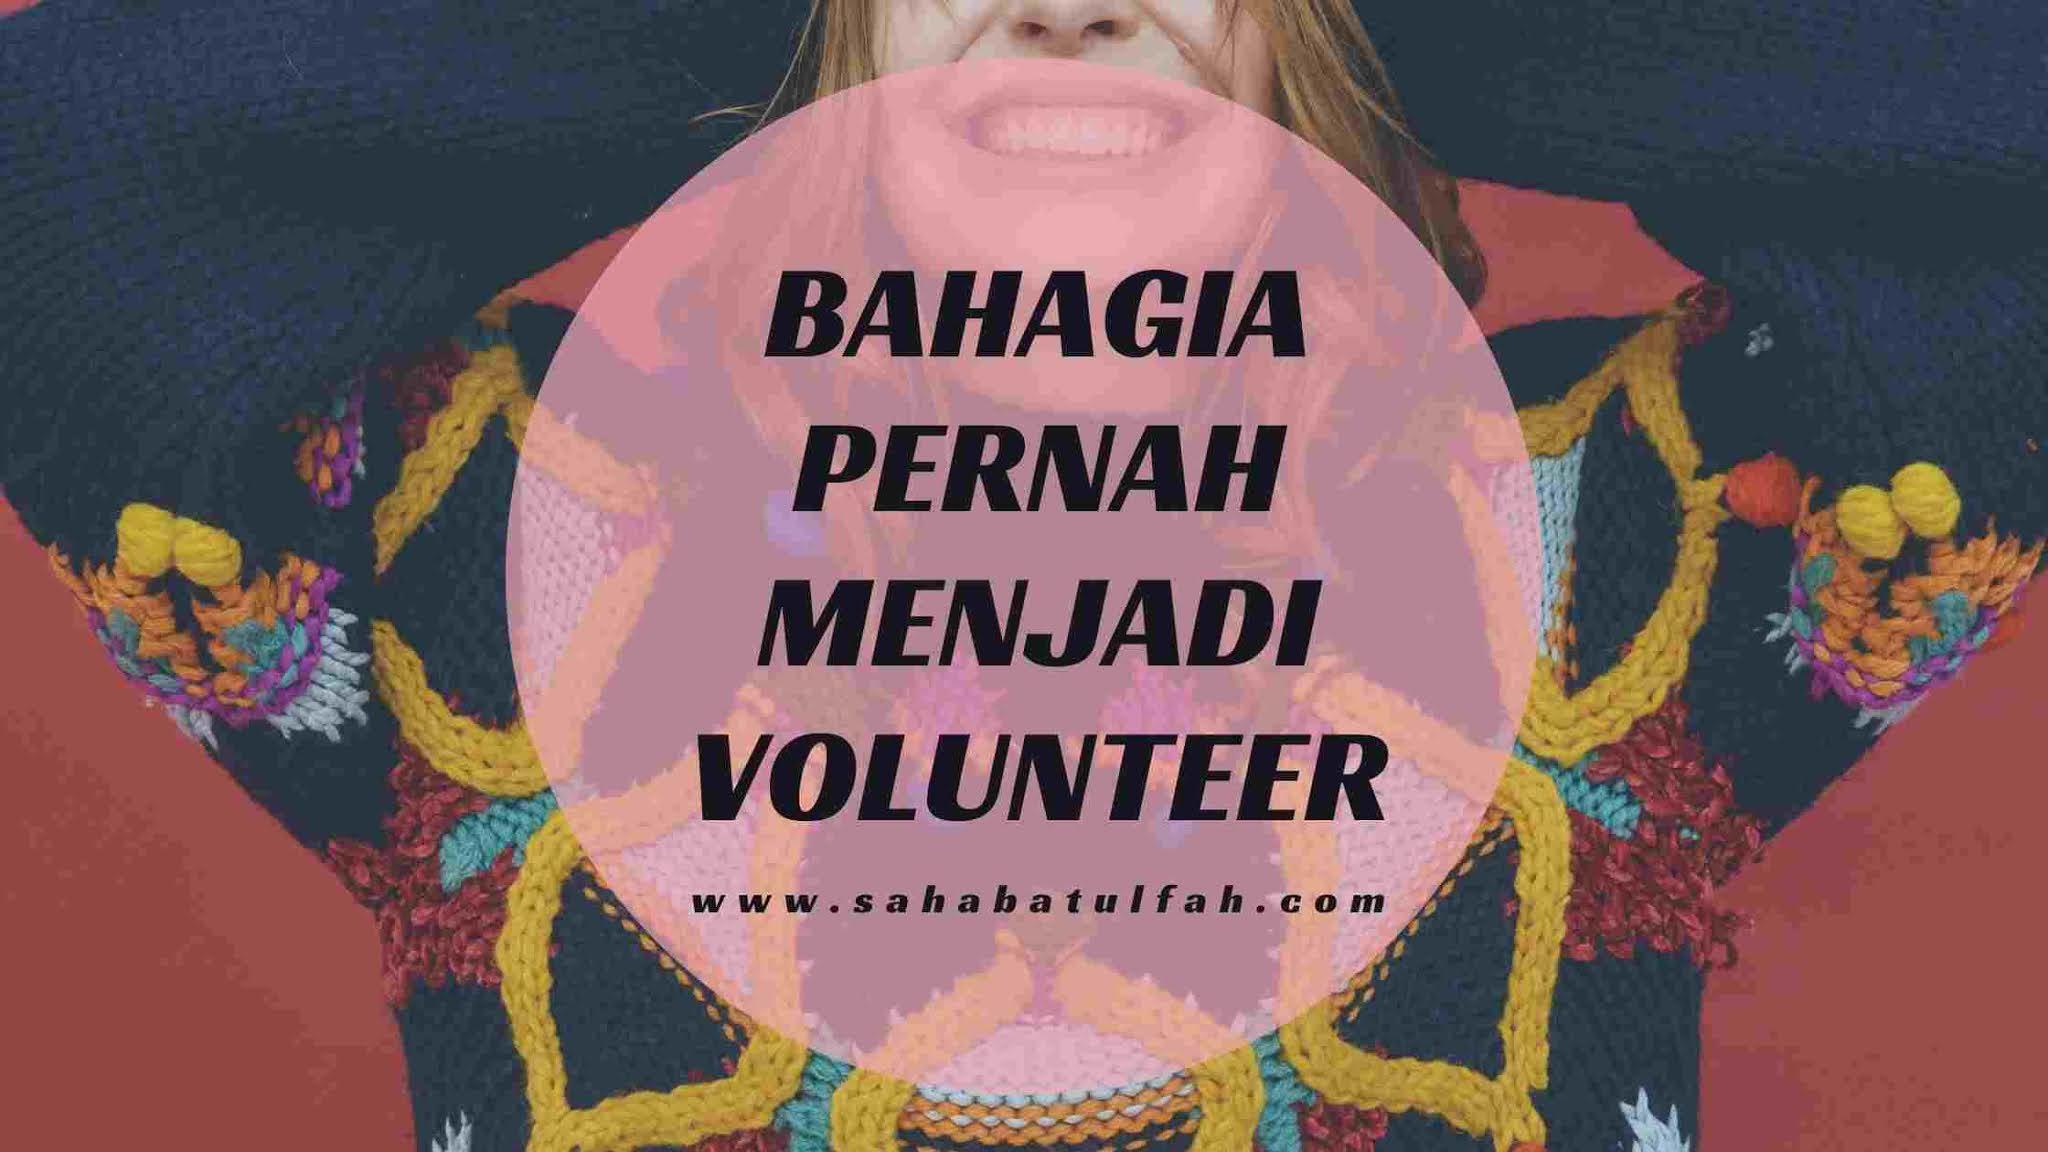 Bahagia-Pernah-Menjadi-Volunteer